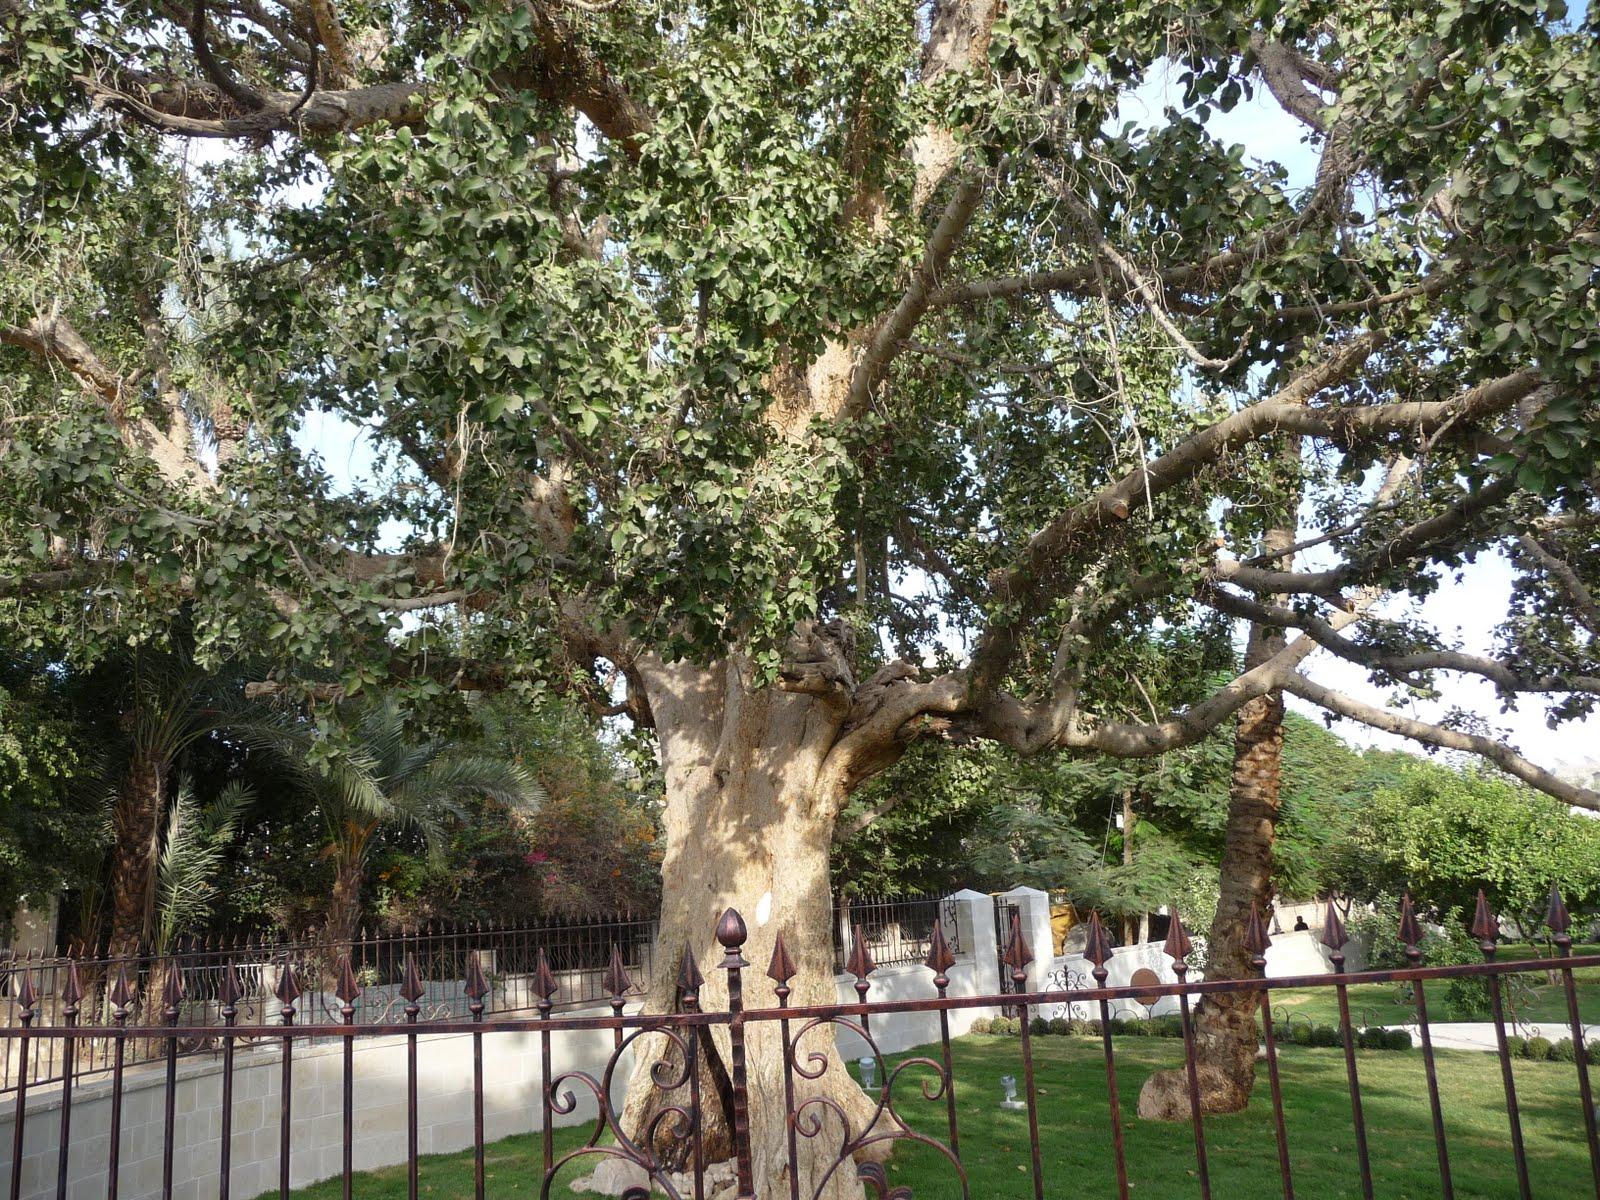 arbol de sicomoro o aliso baja california platanus